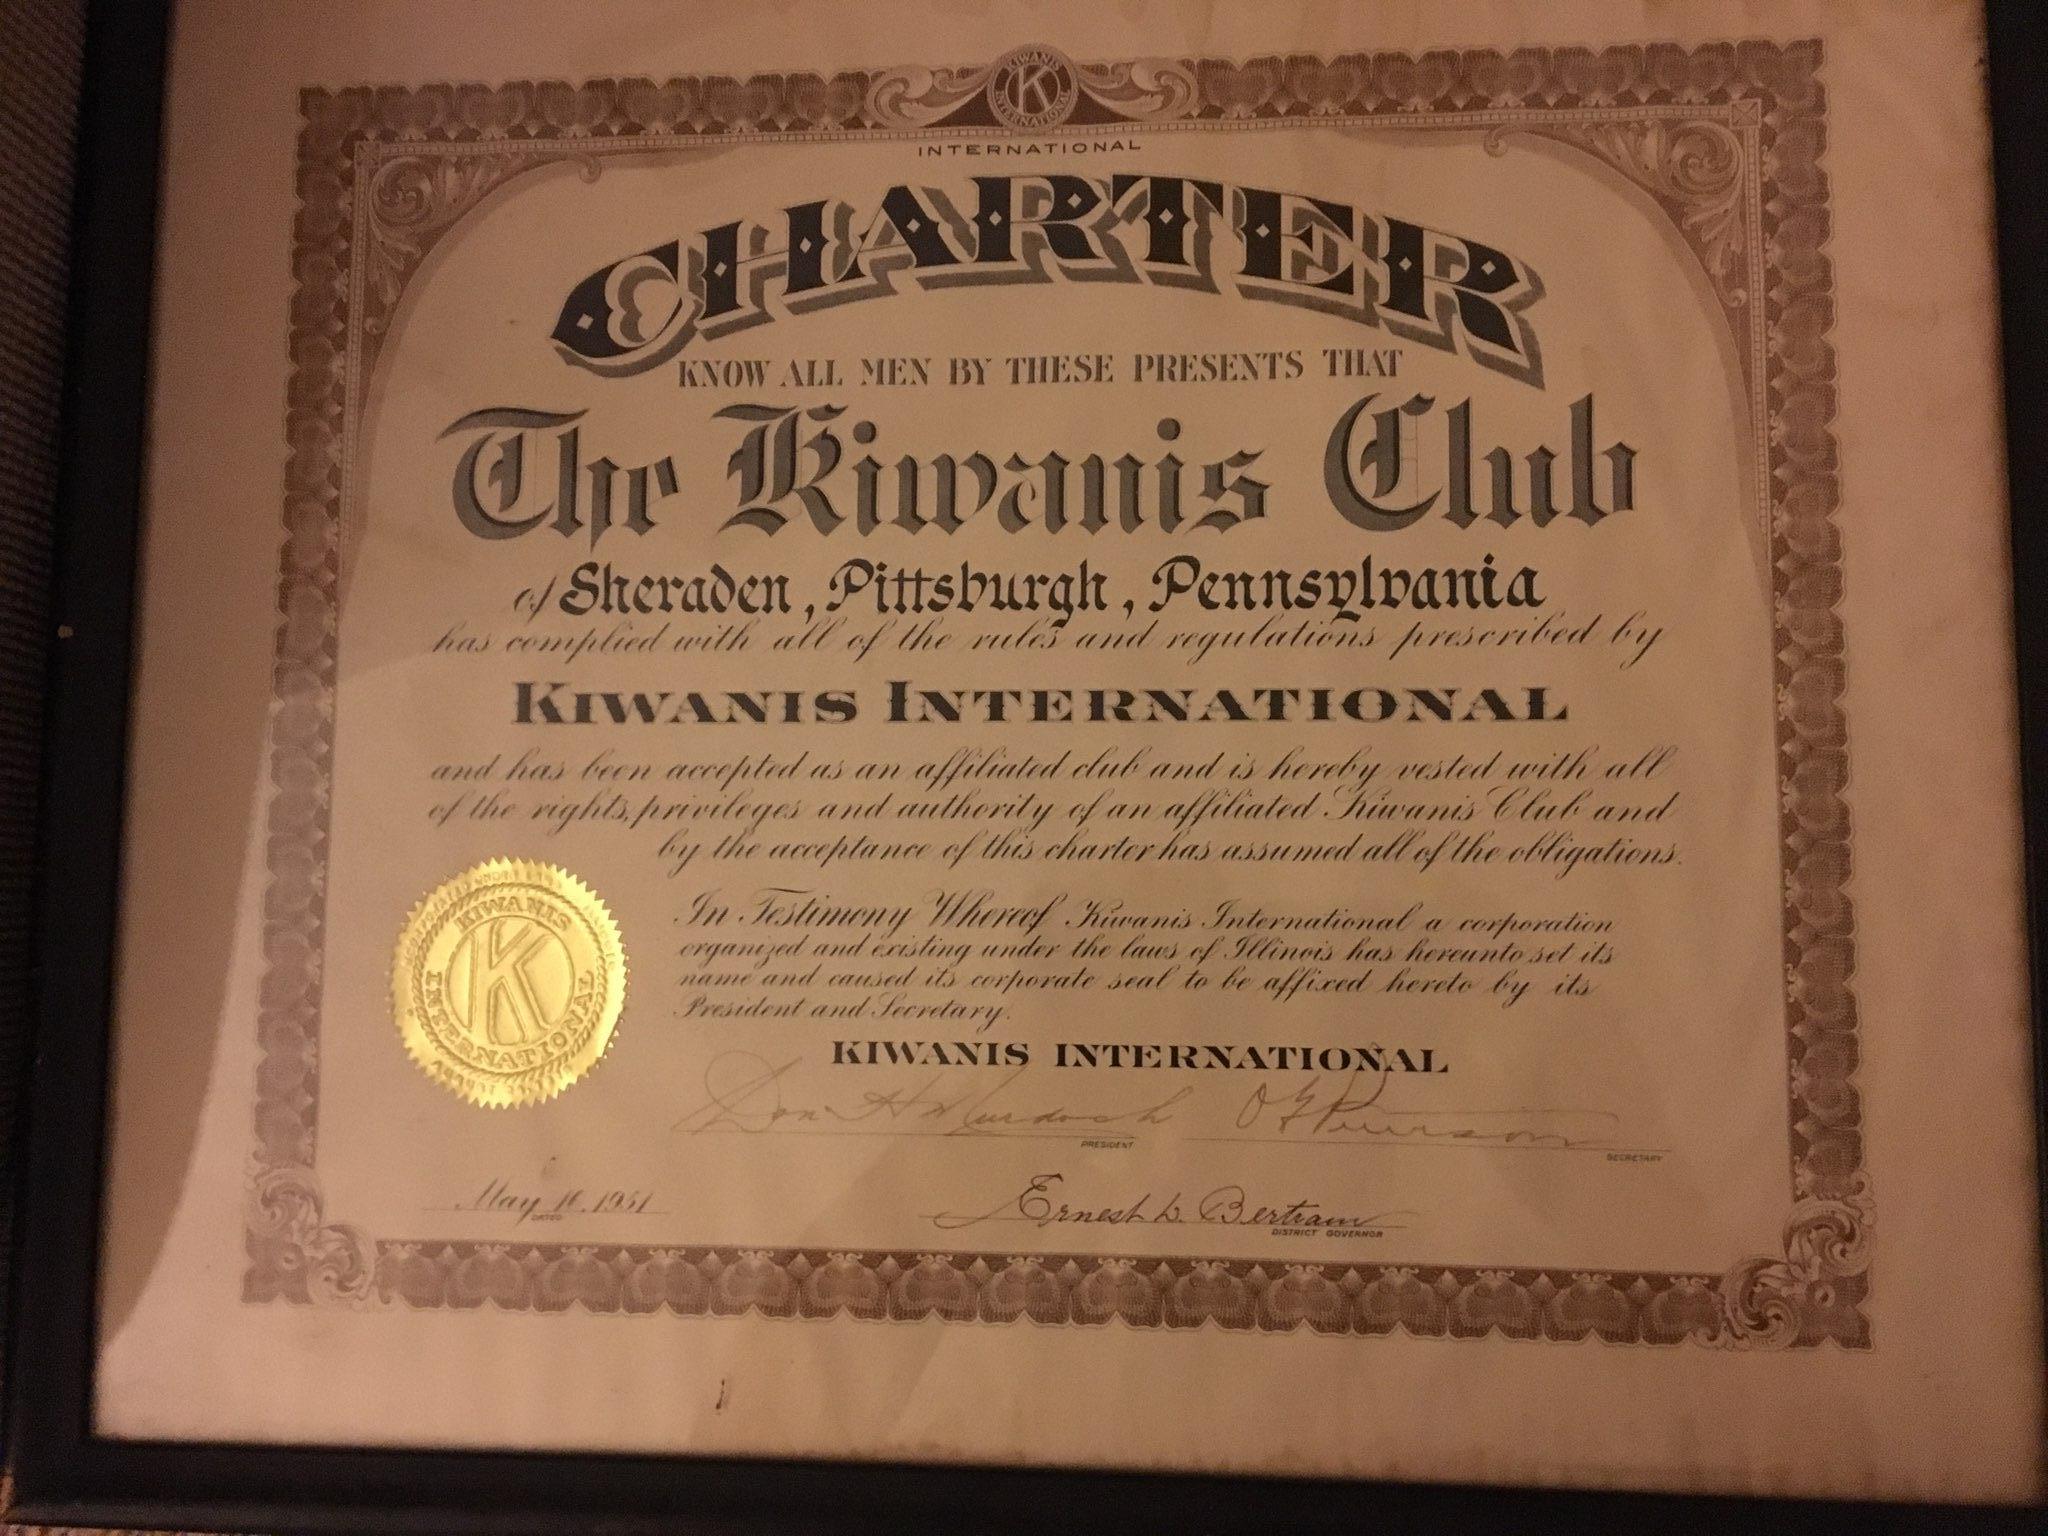 The original charter for the Kiwanis Club of Sheraden.